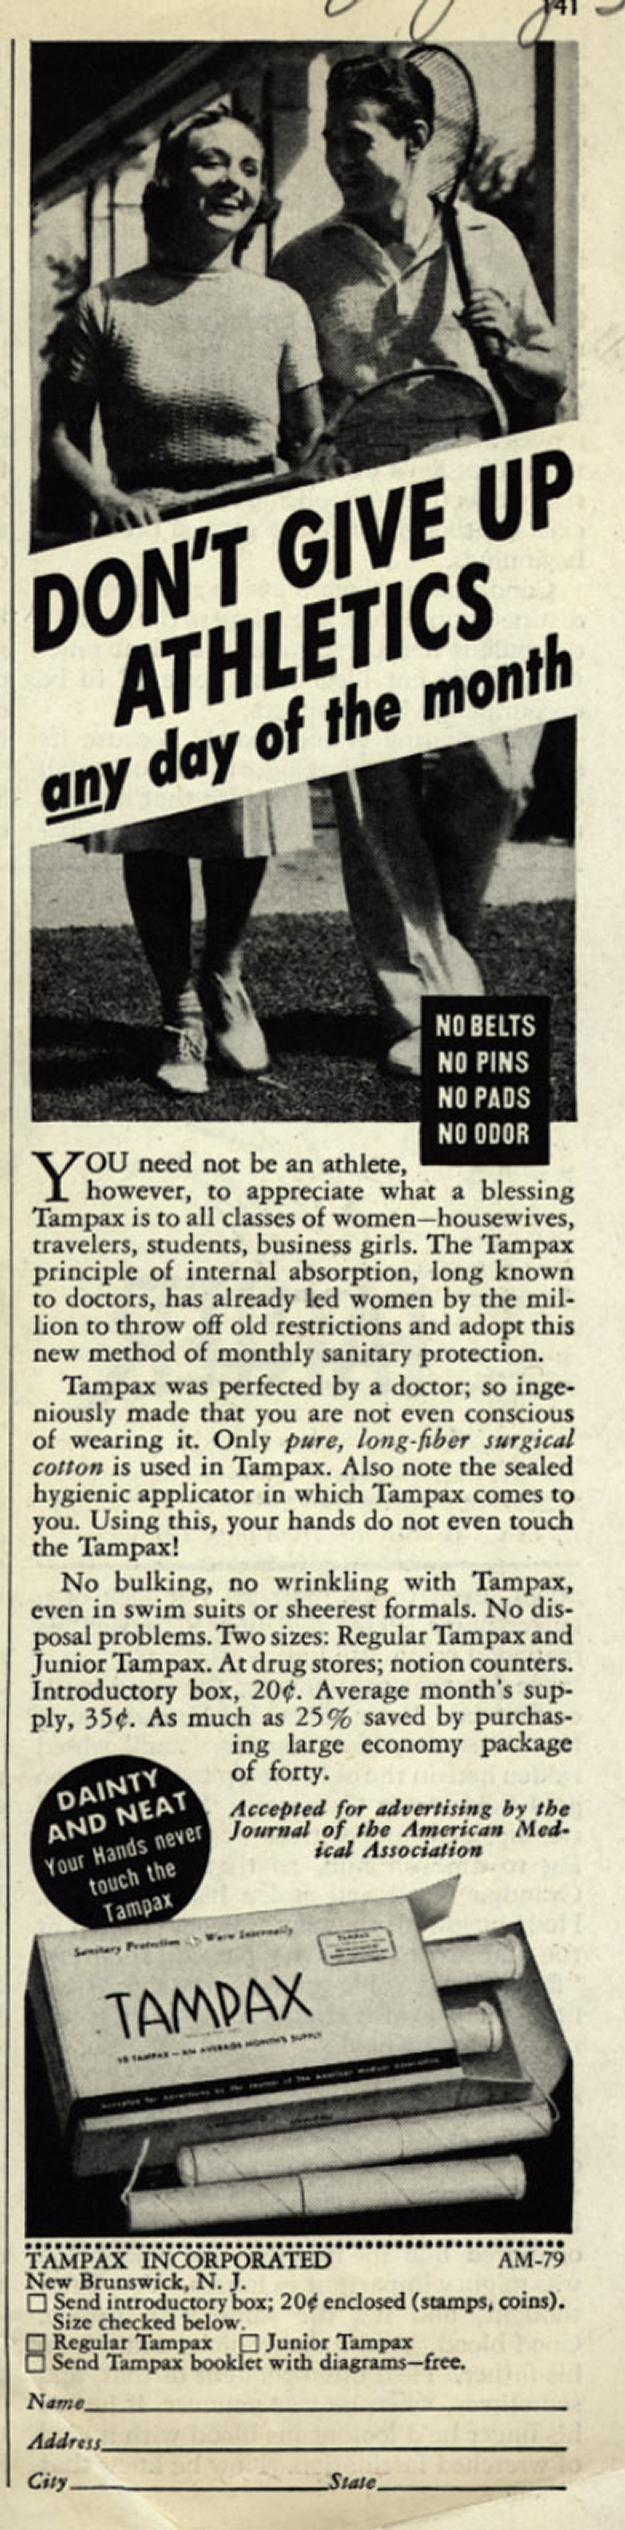 Tampax Inc., 1939